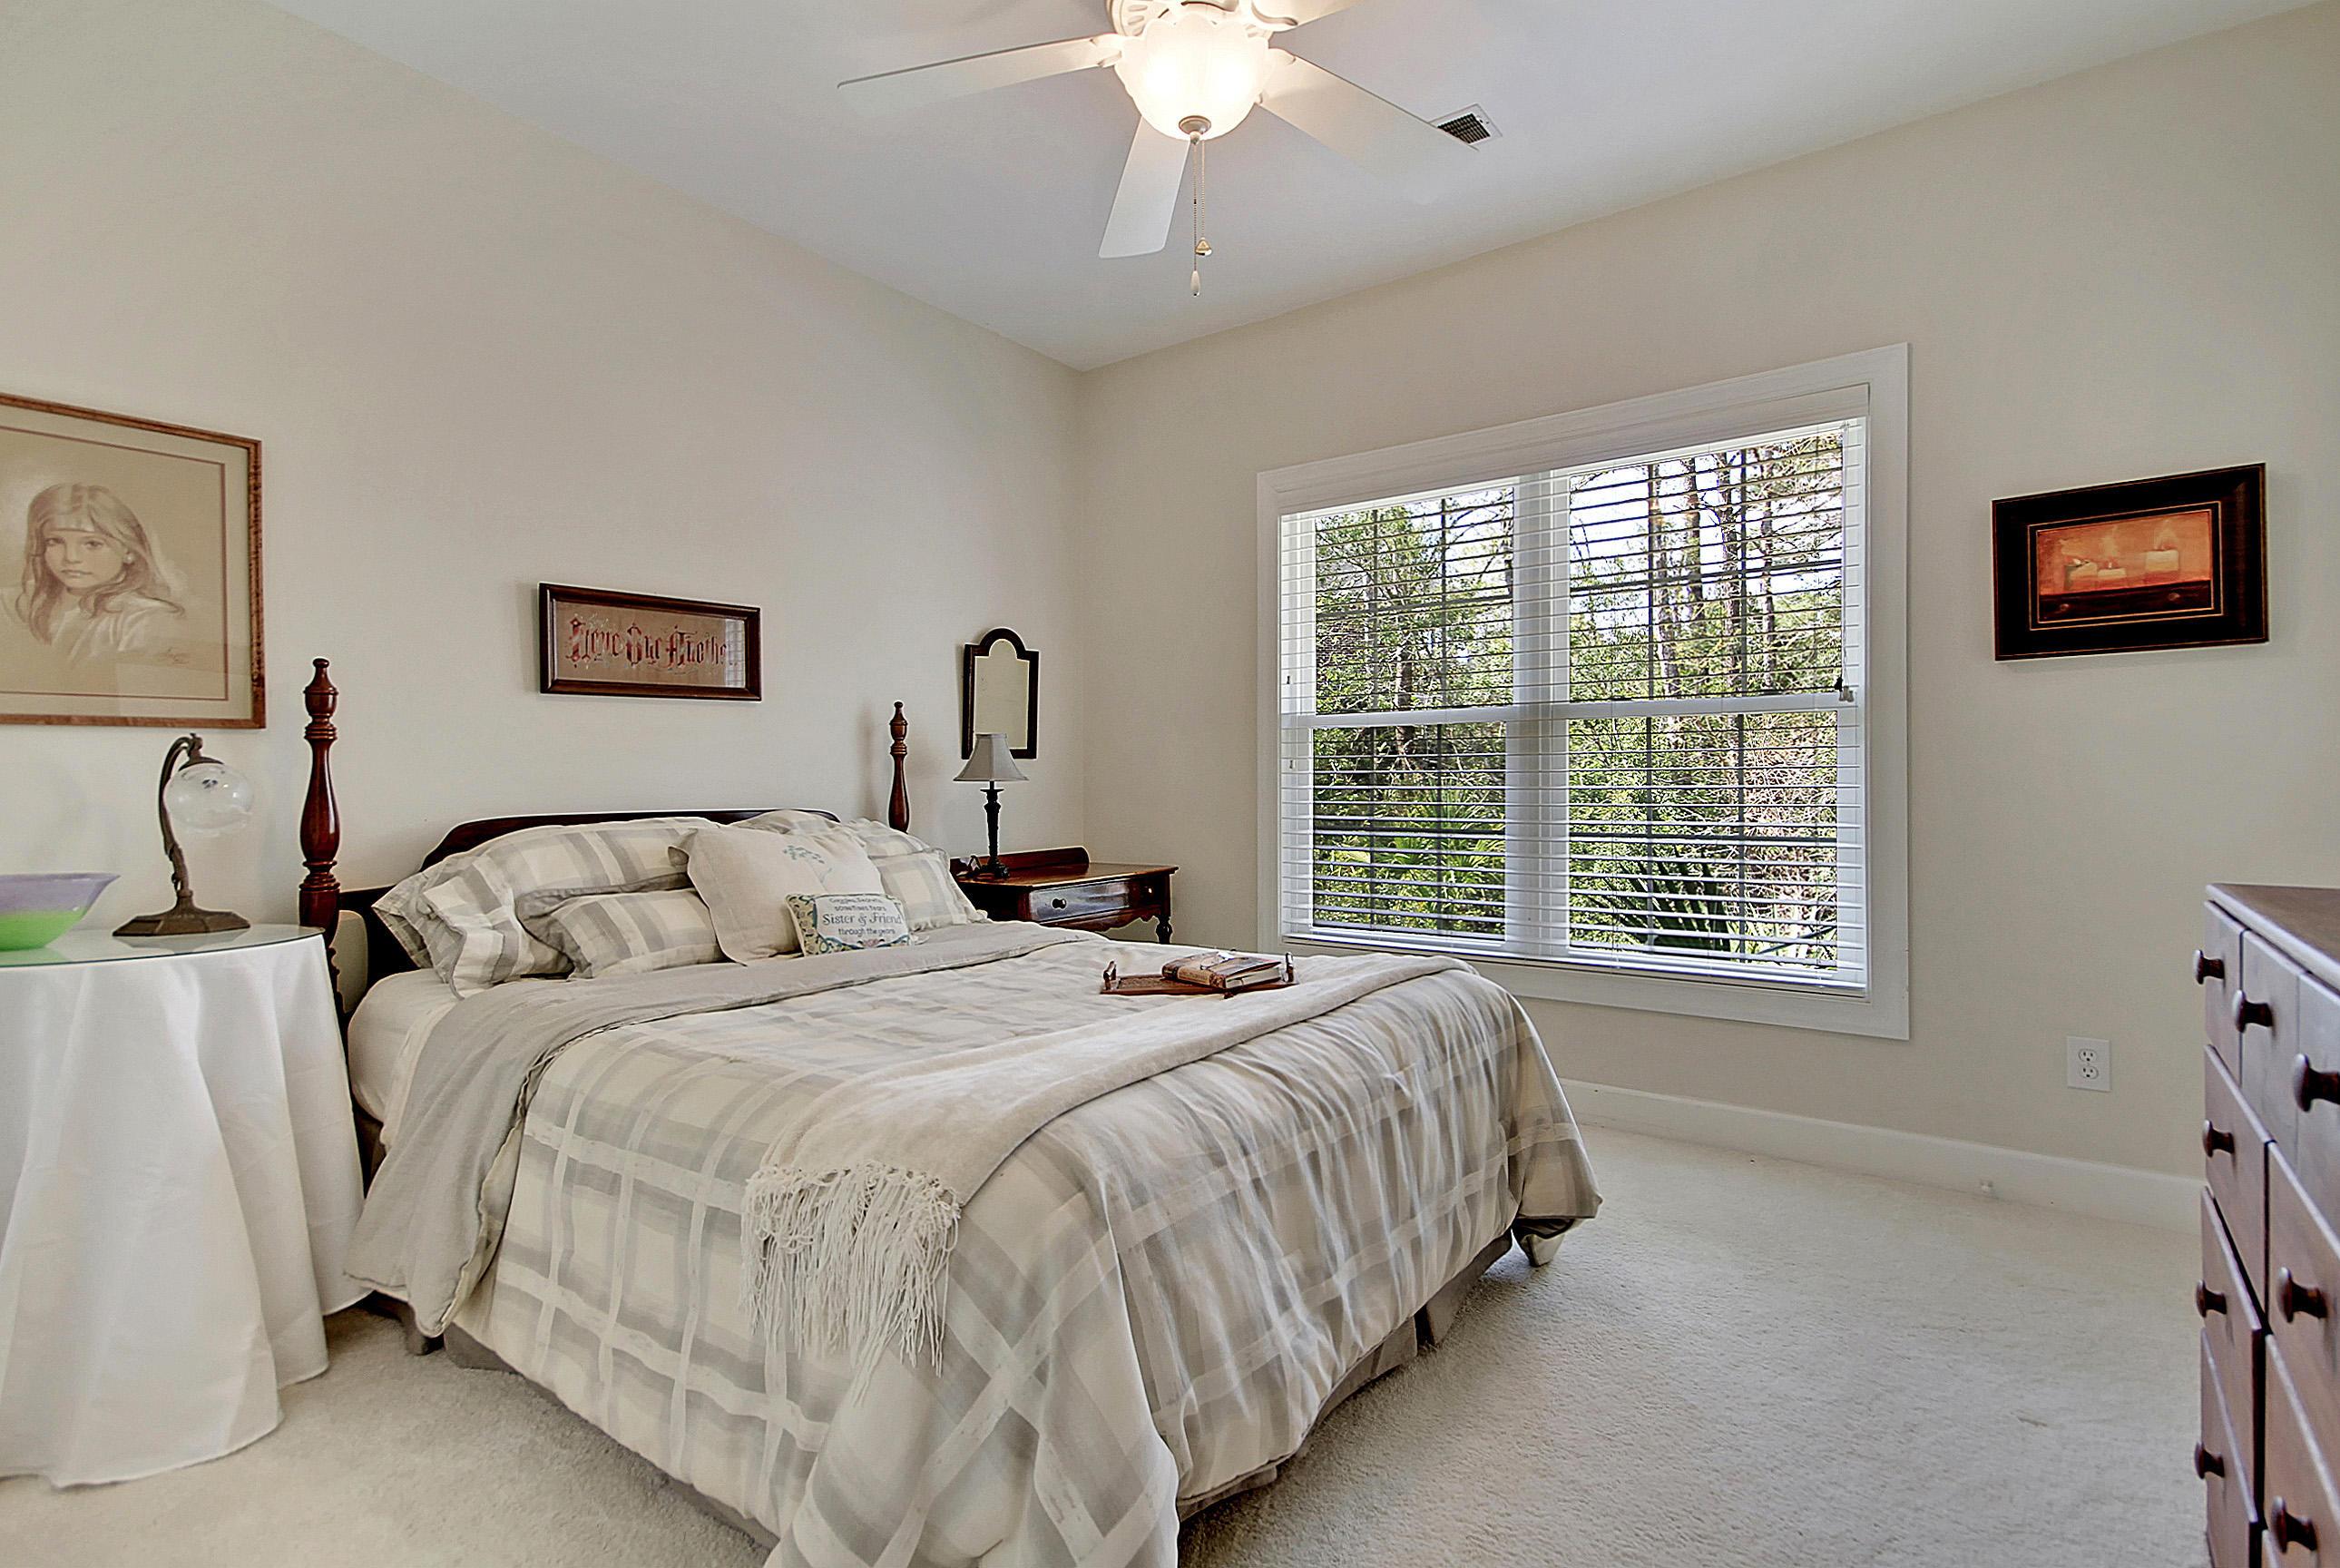 Dunes West Homes For Sale - 4002 Colonel Vanderhorst, Mount Pleasant, SC - 33